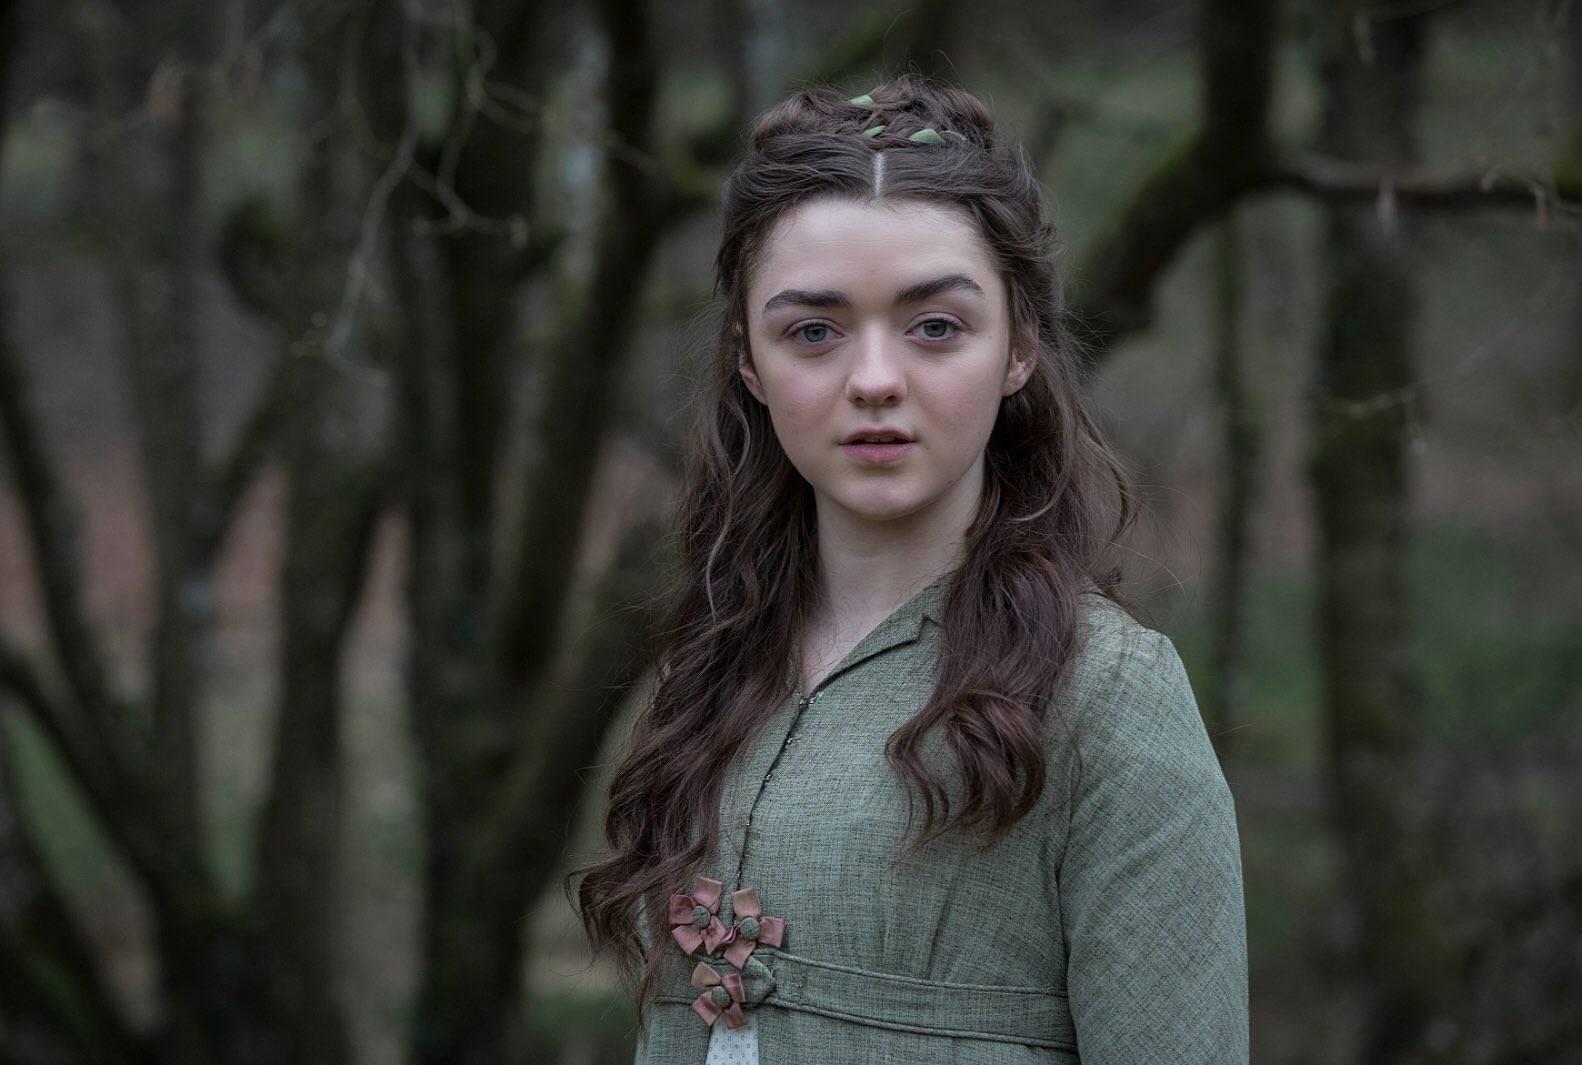 Game of Thrones Arya Stark Wild-Caught Marine Collagen